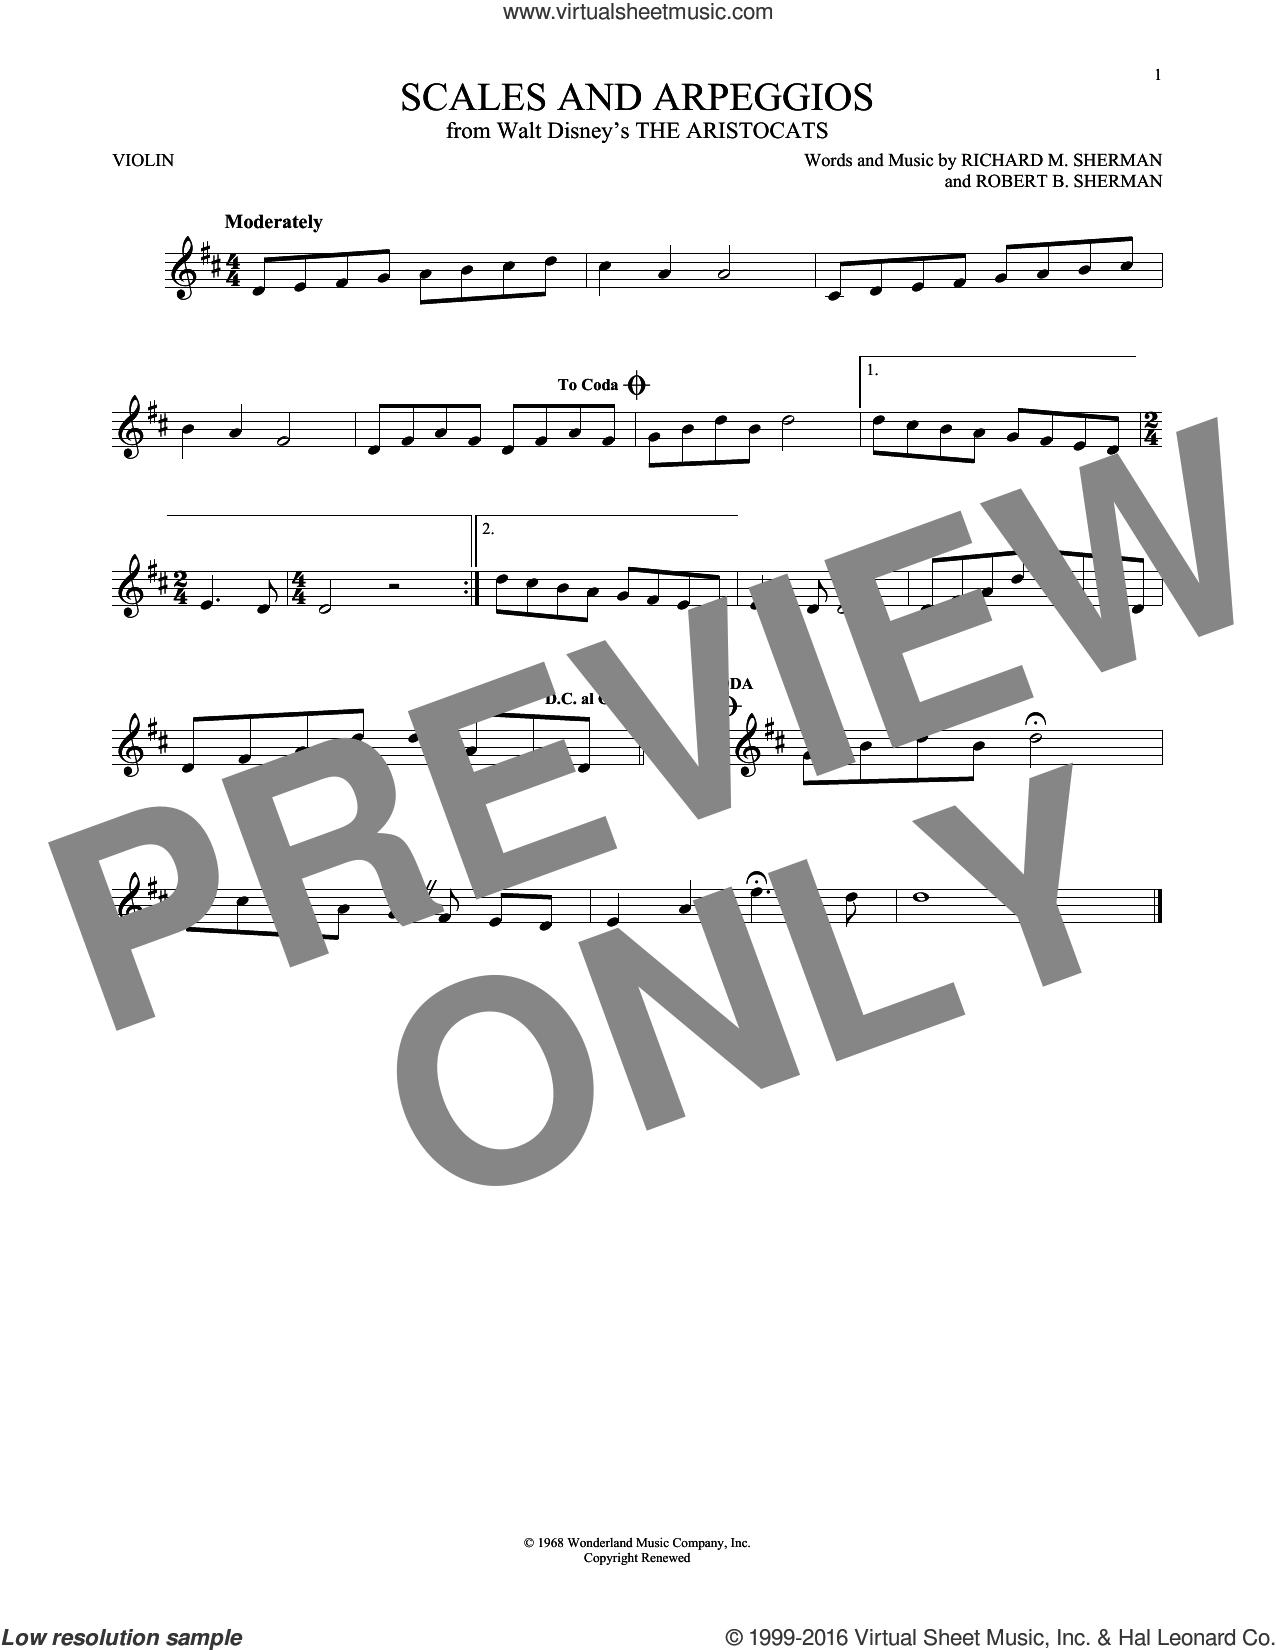 Scales And Arpeggios sheet music for violin solo by Richard M. Sherman, Richard & Robert Sherman and Robert B. Sherman, intermediate skill level